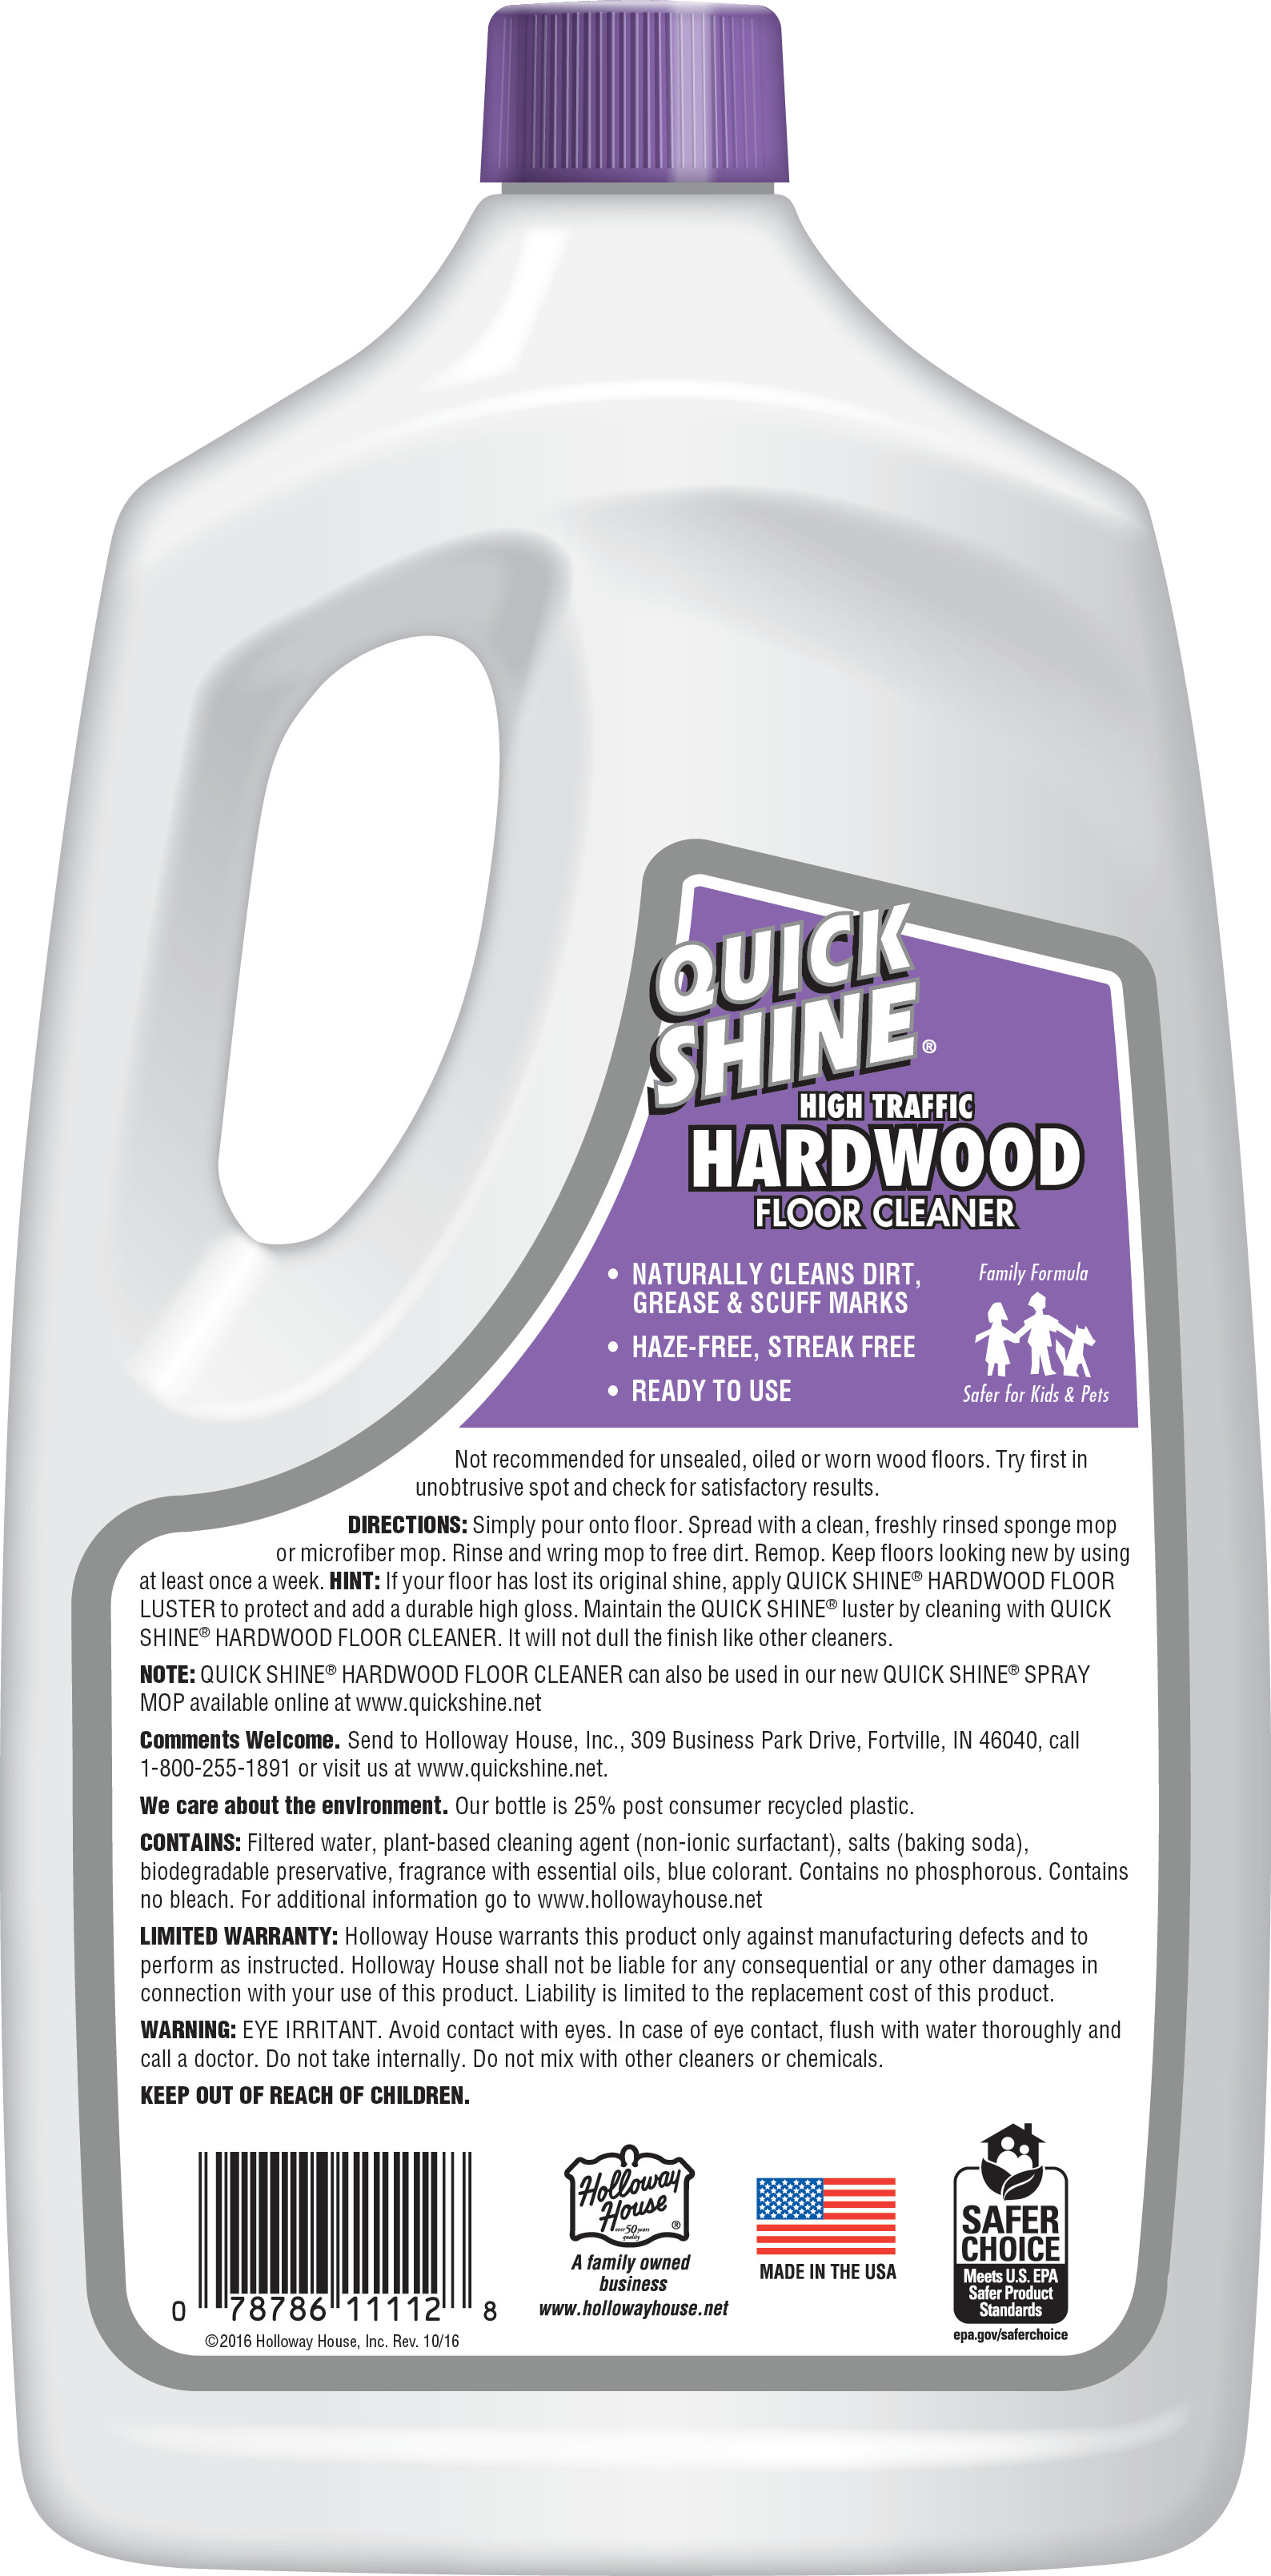 Quick Shine High Traffic Hardwood Floor Cleaner 64 Oz Walmart